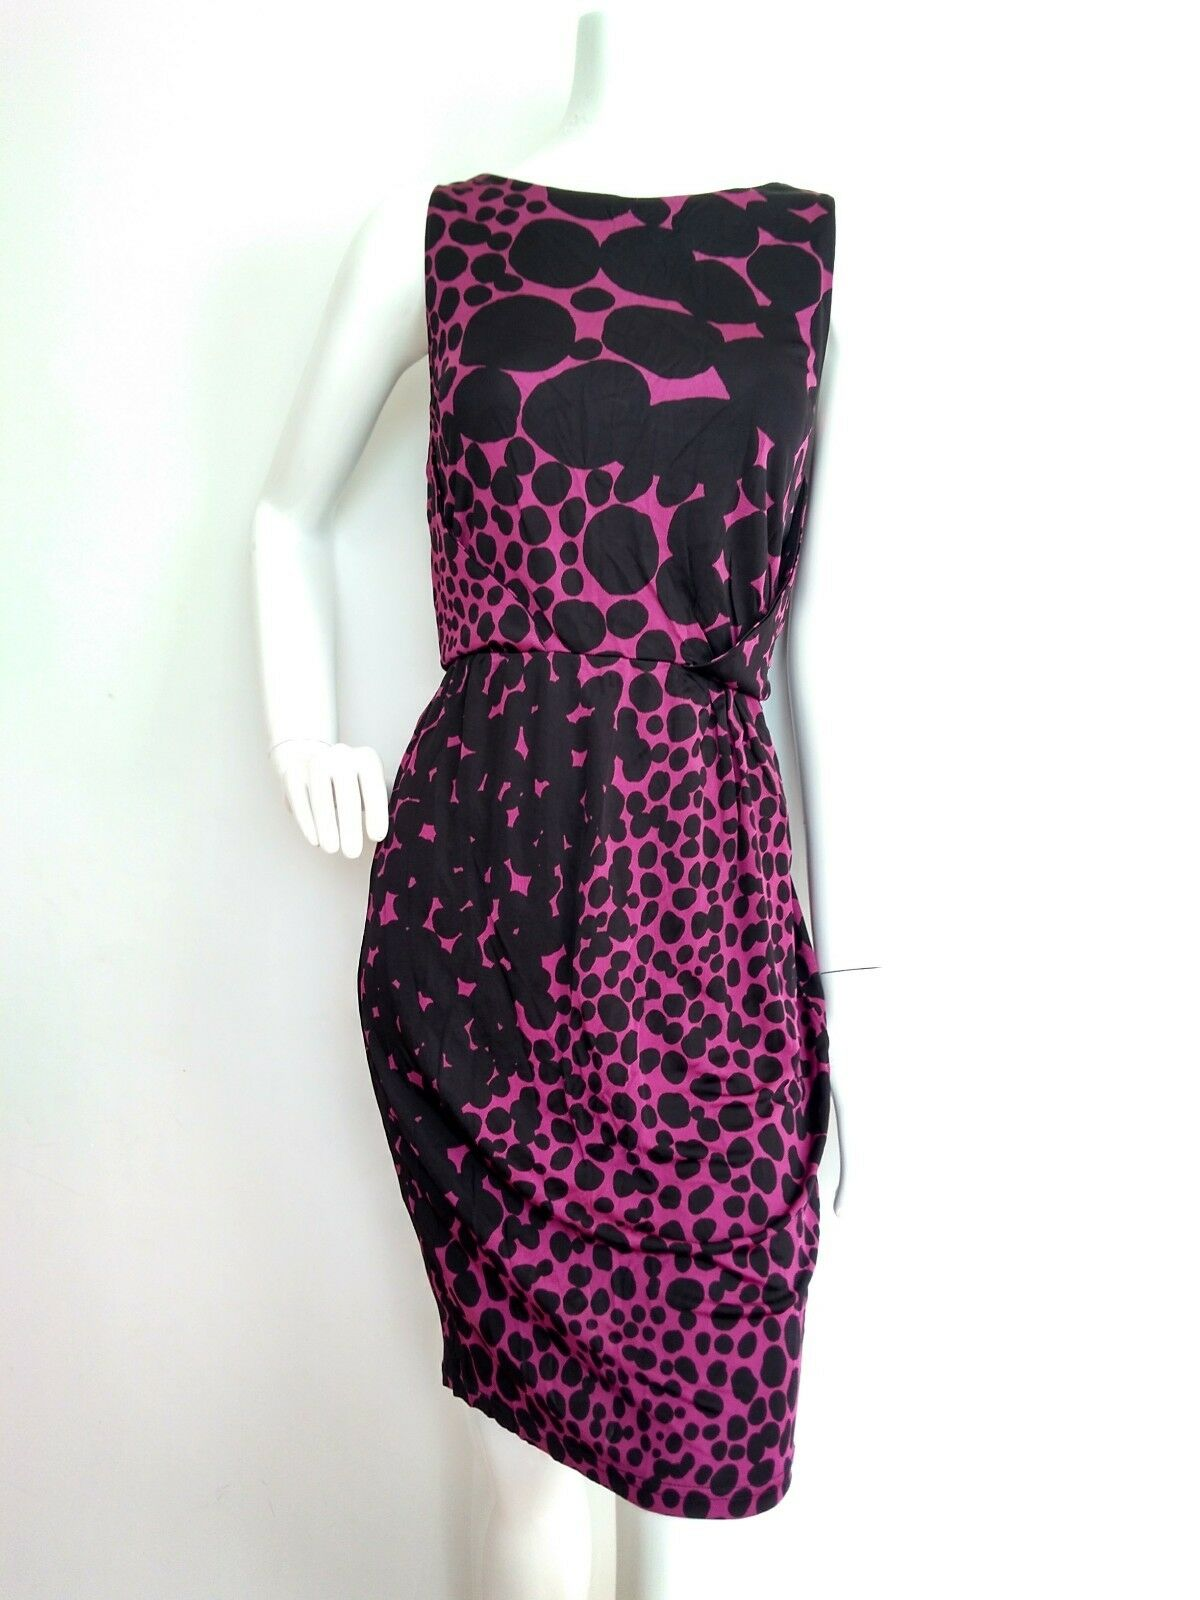 7839dbdf ... Designer LK BENNETT Bess shift dress dress dress size 10 --USED ONCE--  ...